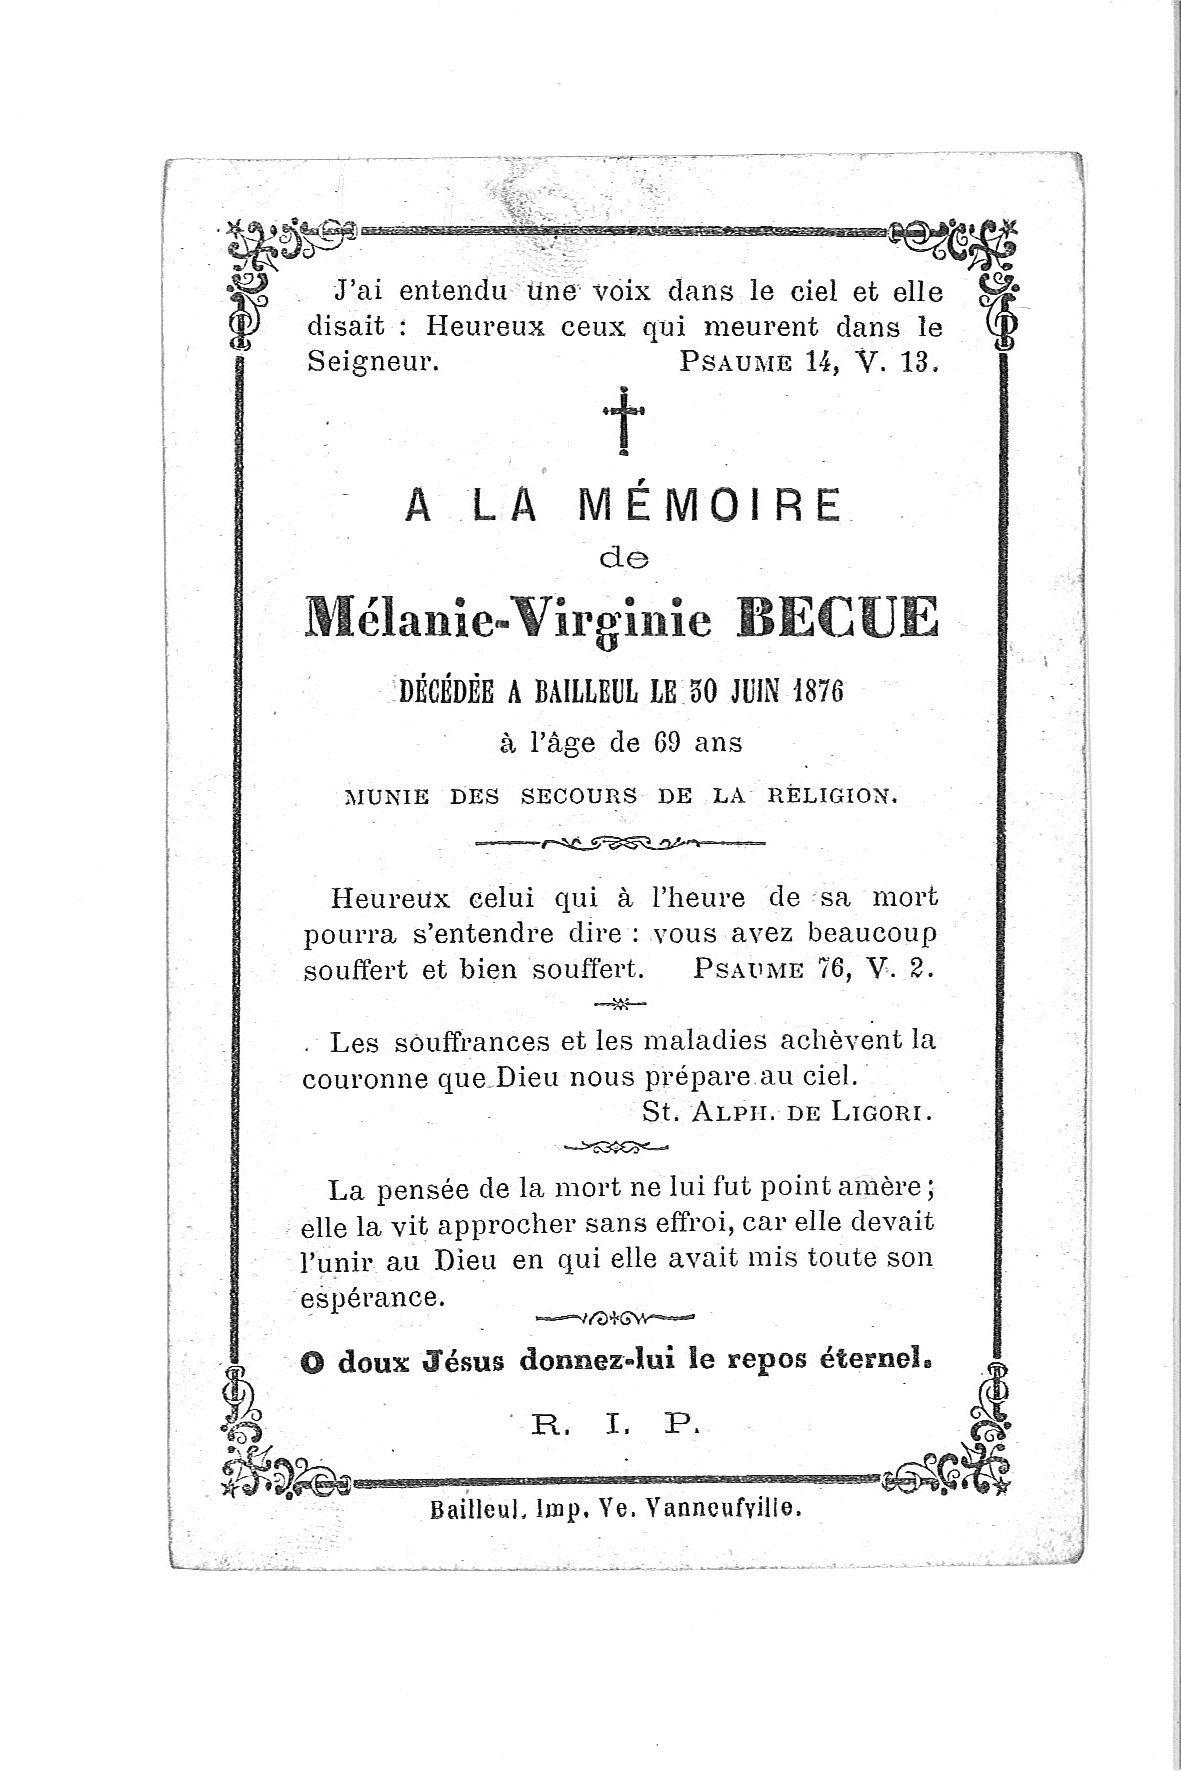 mélanie-virginie(1876)20090813090145_00035.jpg